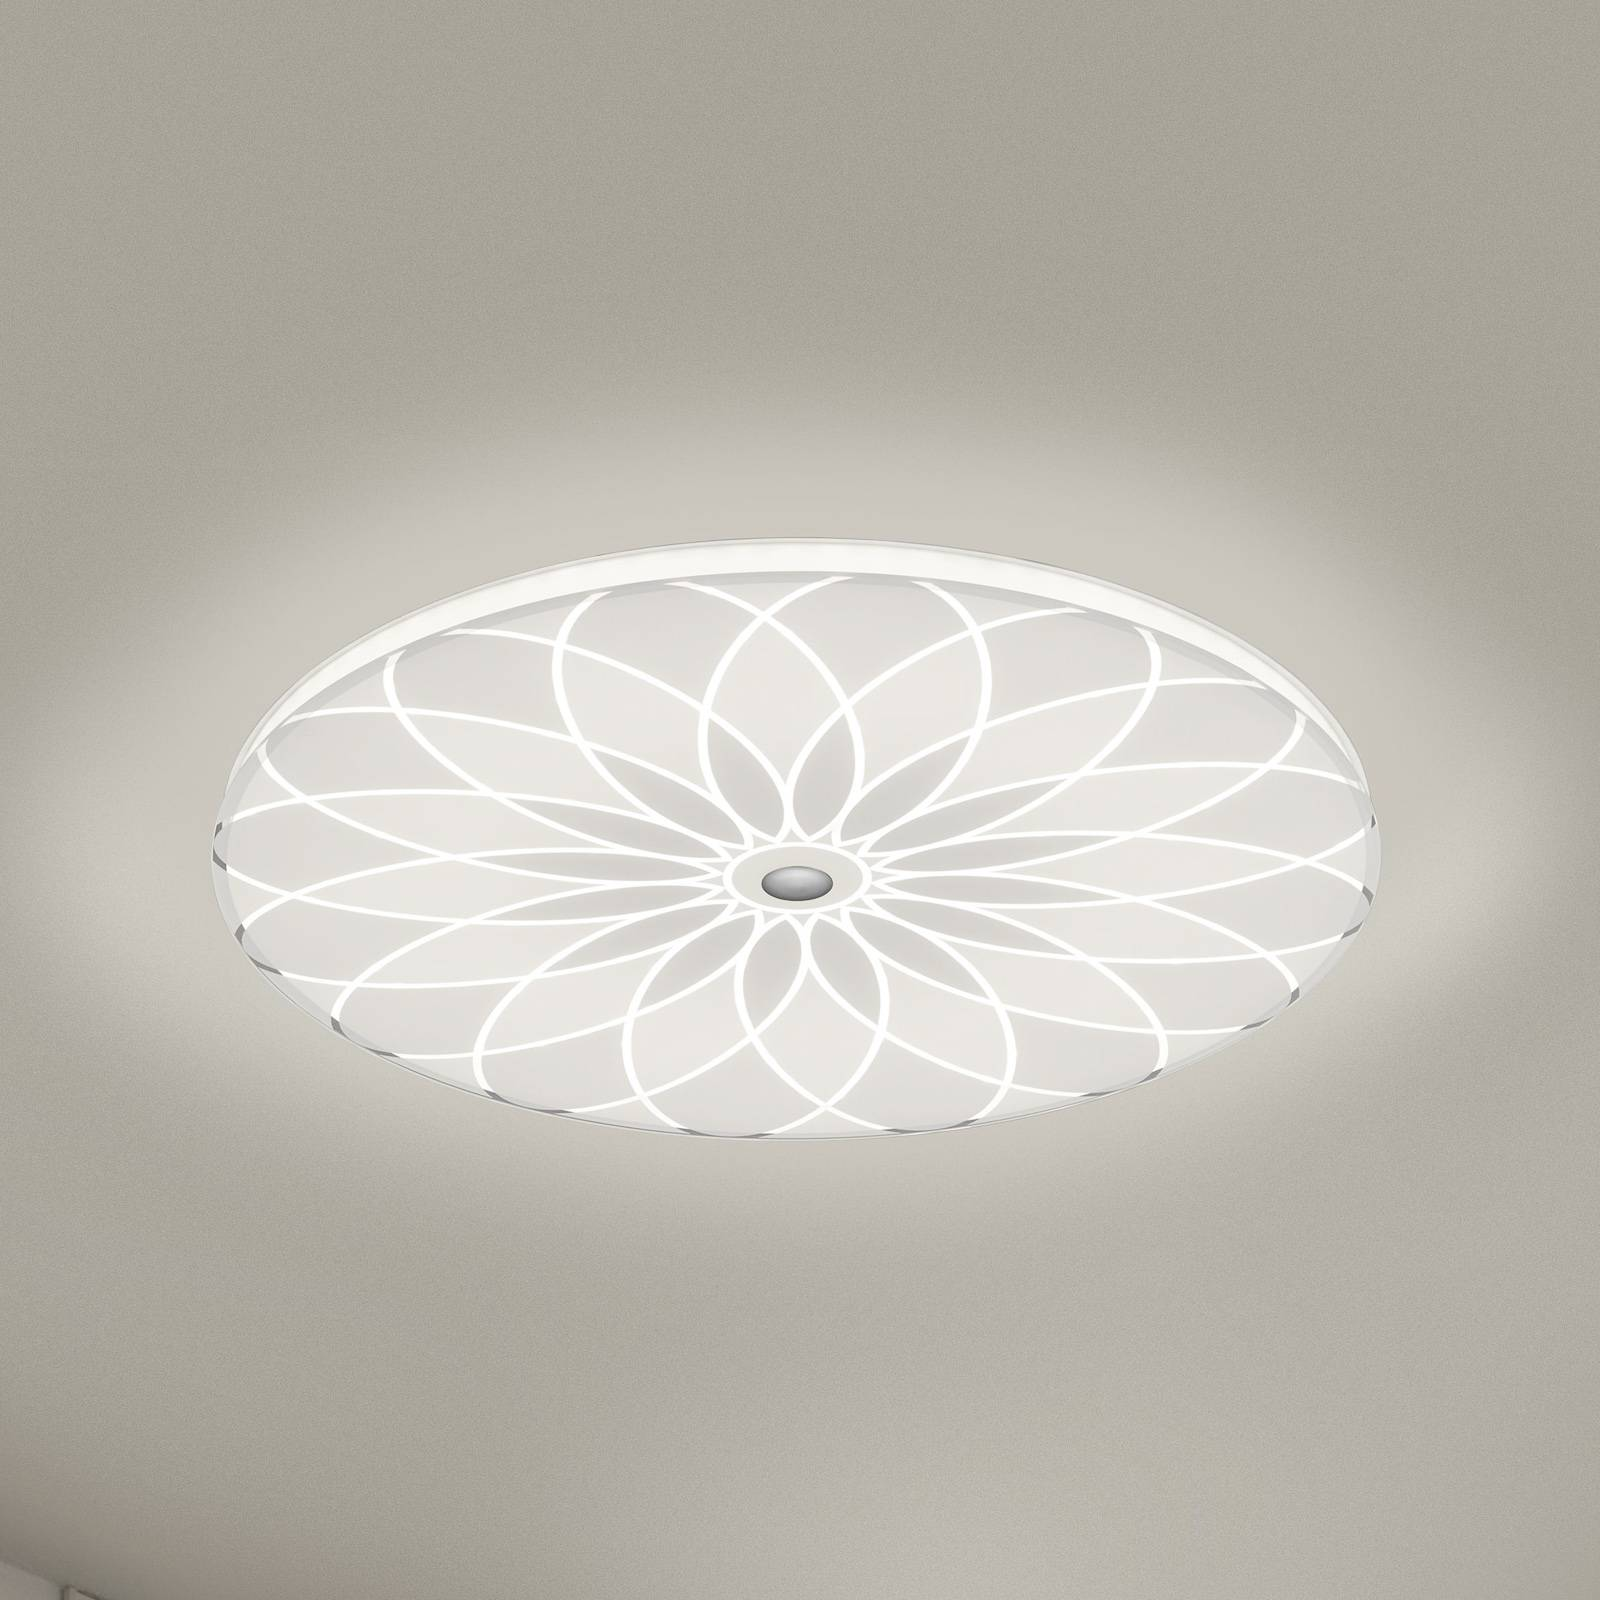 BANKAMP Mandala LED-kattovalaisin kukka, Ø 52 cm